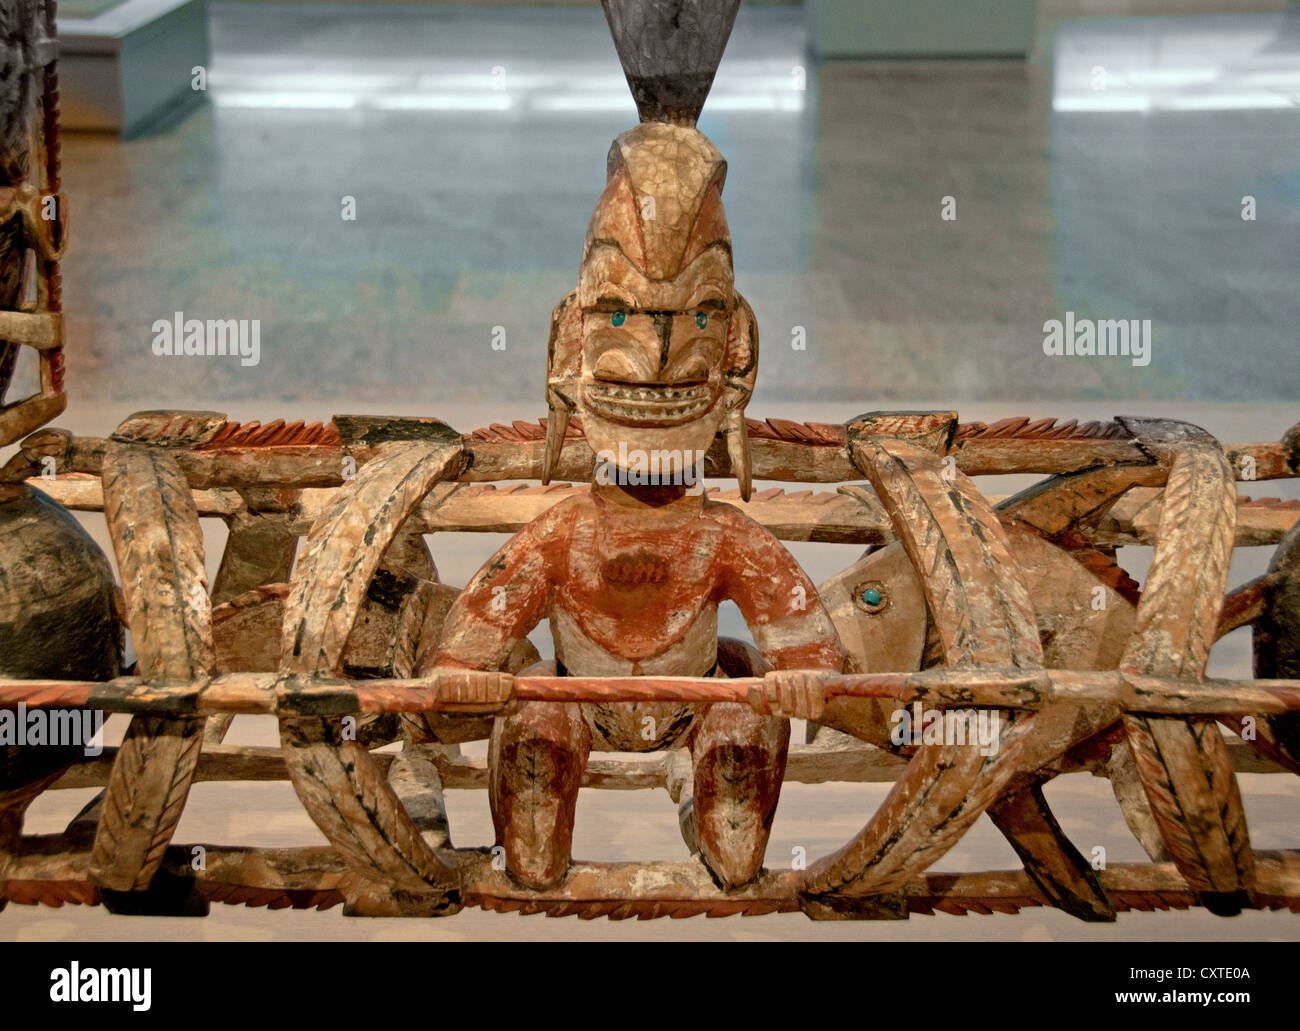 Malanggan New Ireland Papua New Guinea Oceania Museum - Stock Image